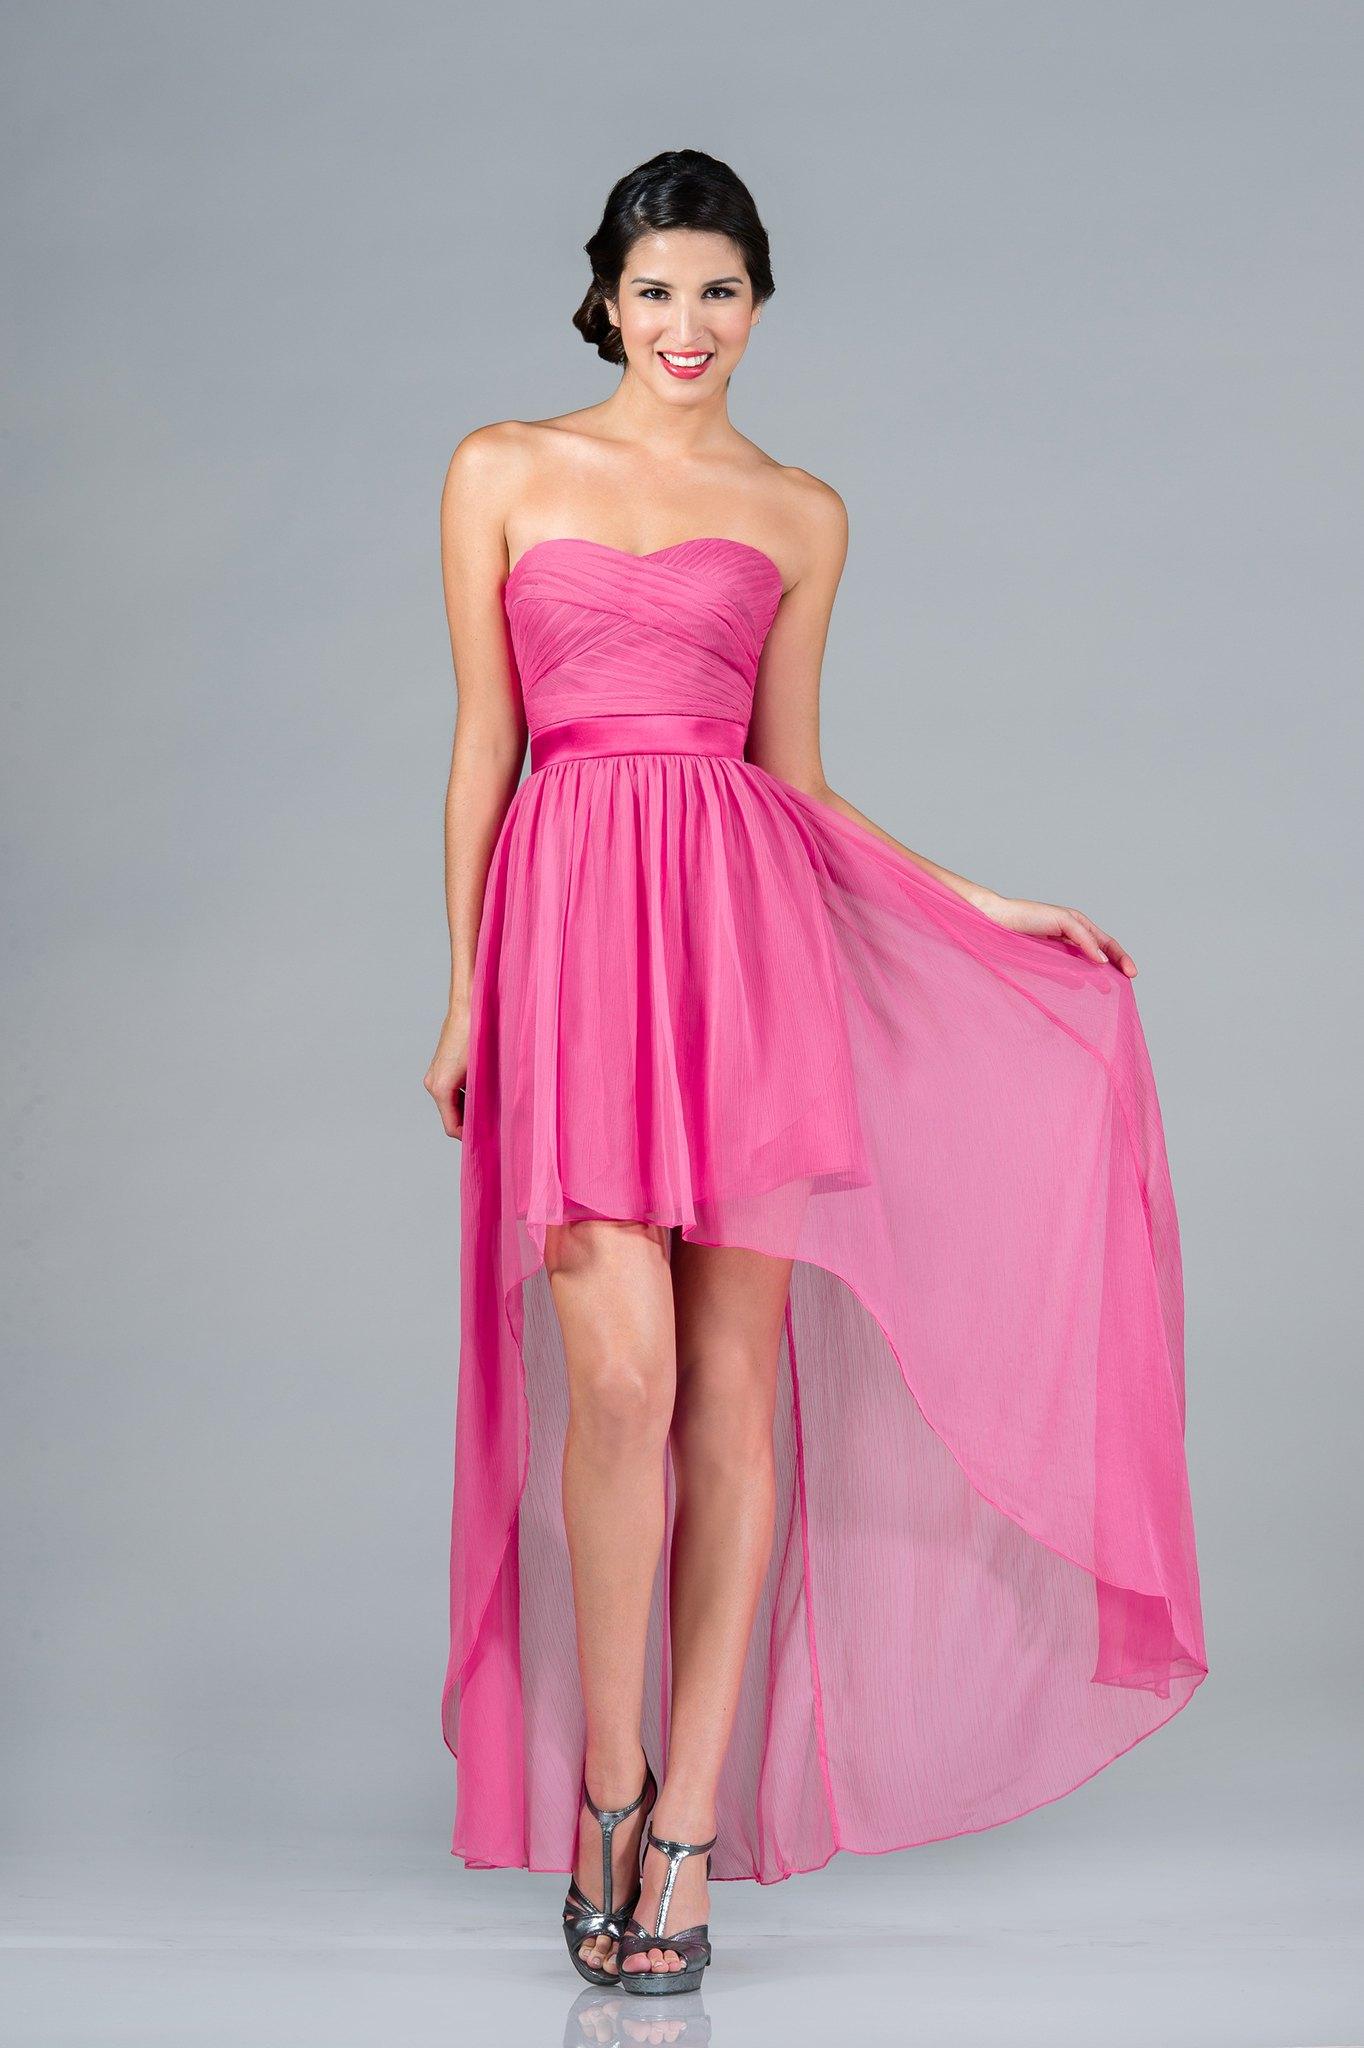 Modest Fun Elegant Prom Dresses - Prom Dresses Vicky